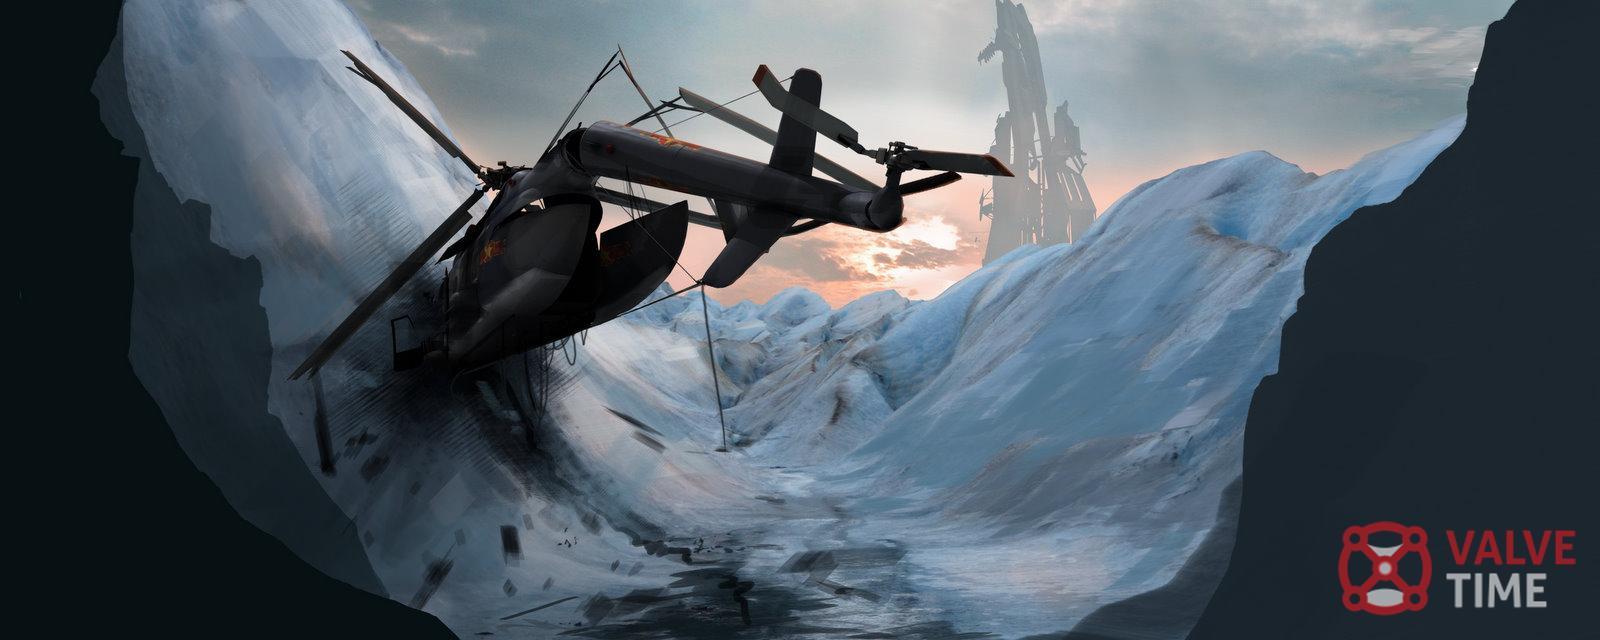 Na internetu se objevila série artworků Half-Life 2: Episode Three z roku 2008 67248